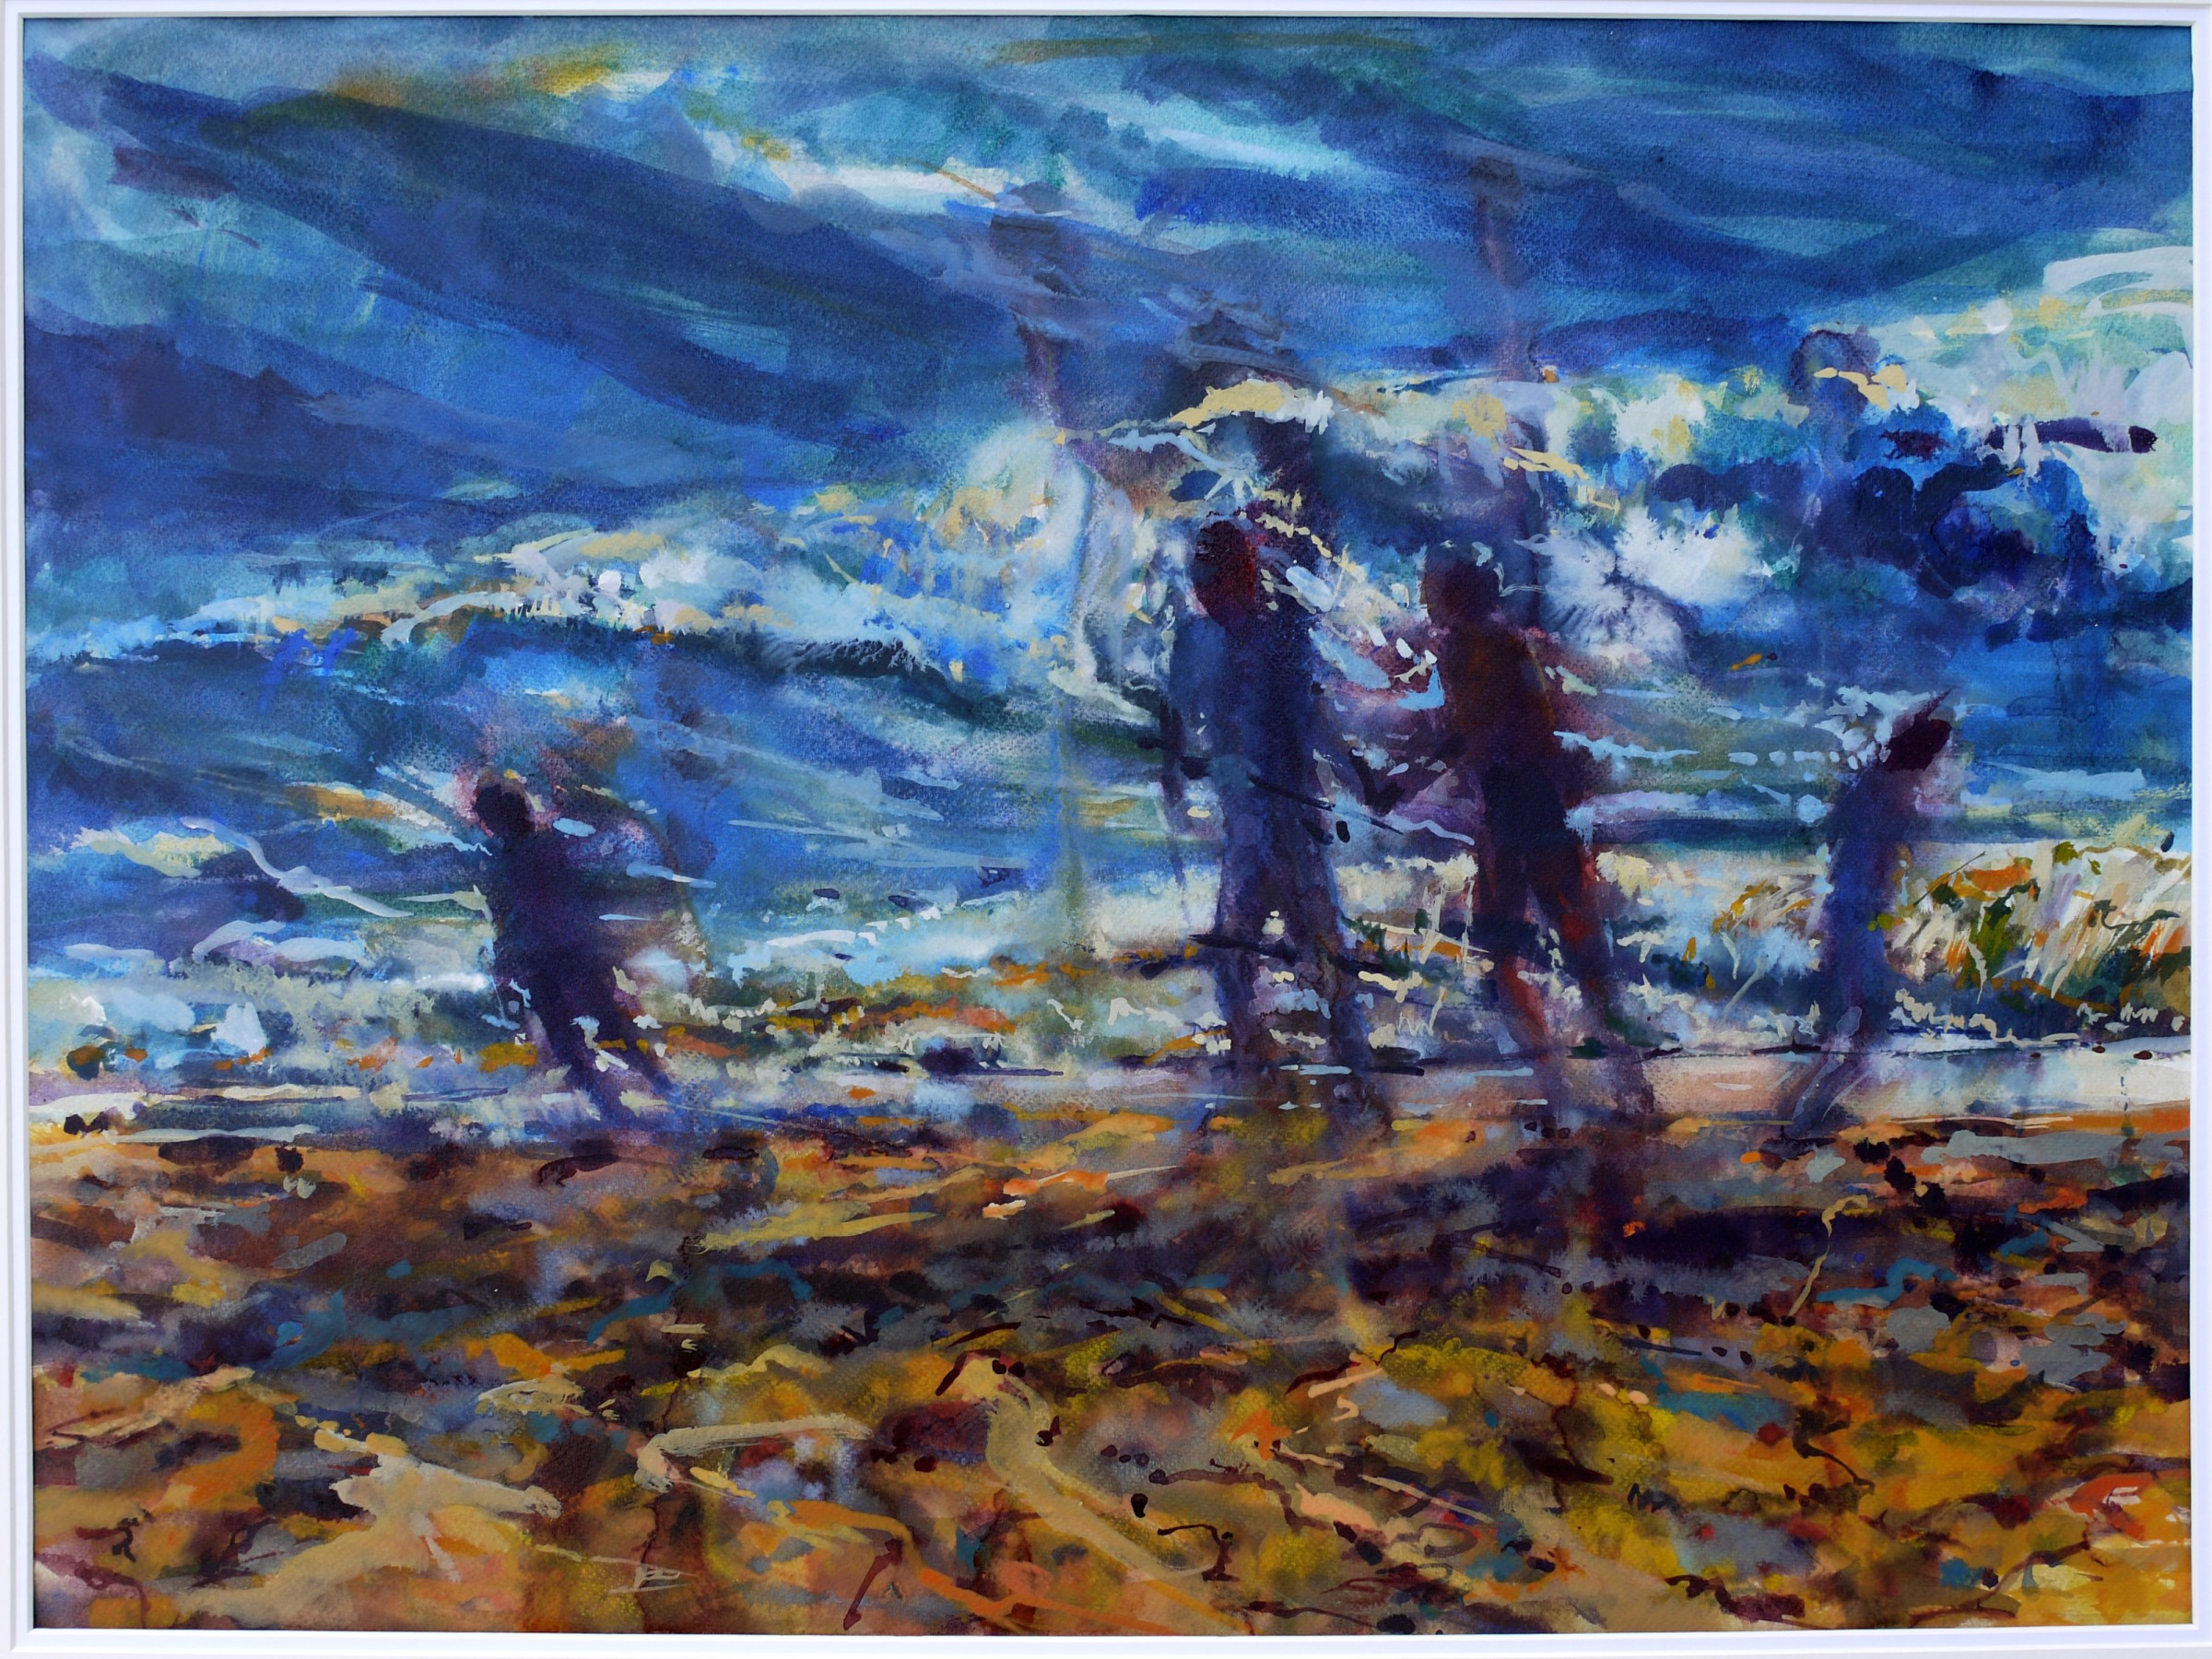 <span class=&#34;link fancybox-details-link&#34;><a href=&#34;/exhibitions/24/works/artworks_standalone10838/&#34;>View Detail Page</a></span><div class=&#34;artist&#34;><span class=&#34;artist&#34;><strong>Francis Bowyer</strong></span></div><div class=&#34;title&#34;><em>An Evening Paddle</em></div><div class=&#34;medium&#34;>watercolour</div>